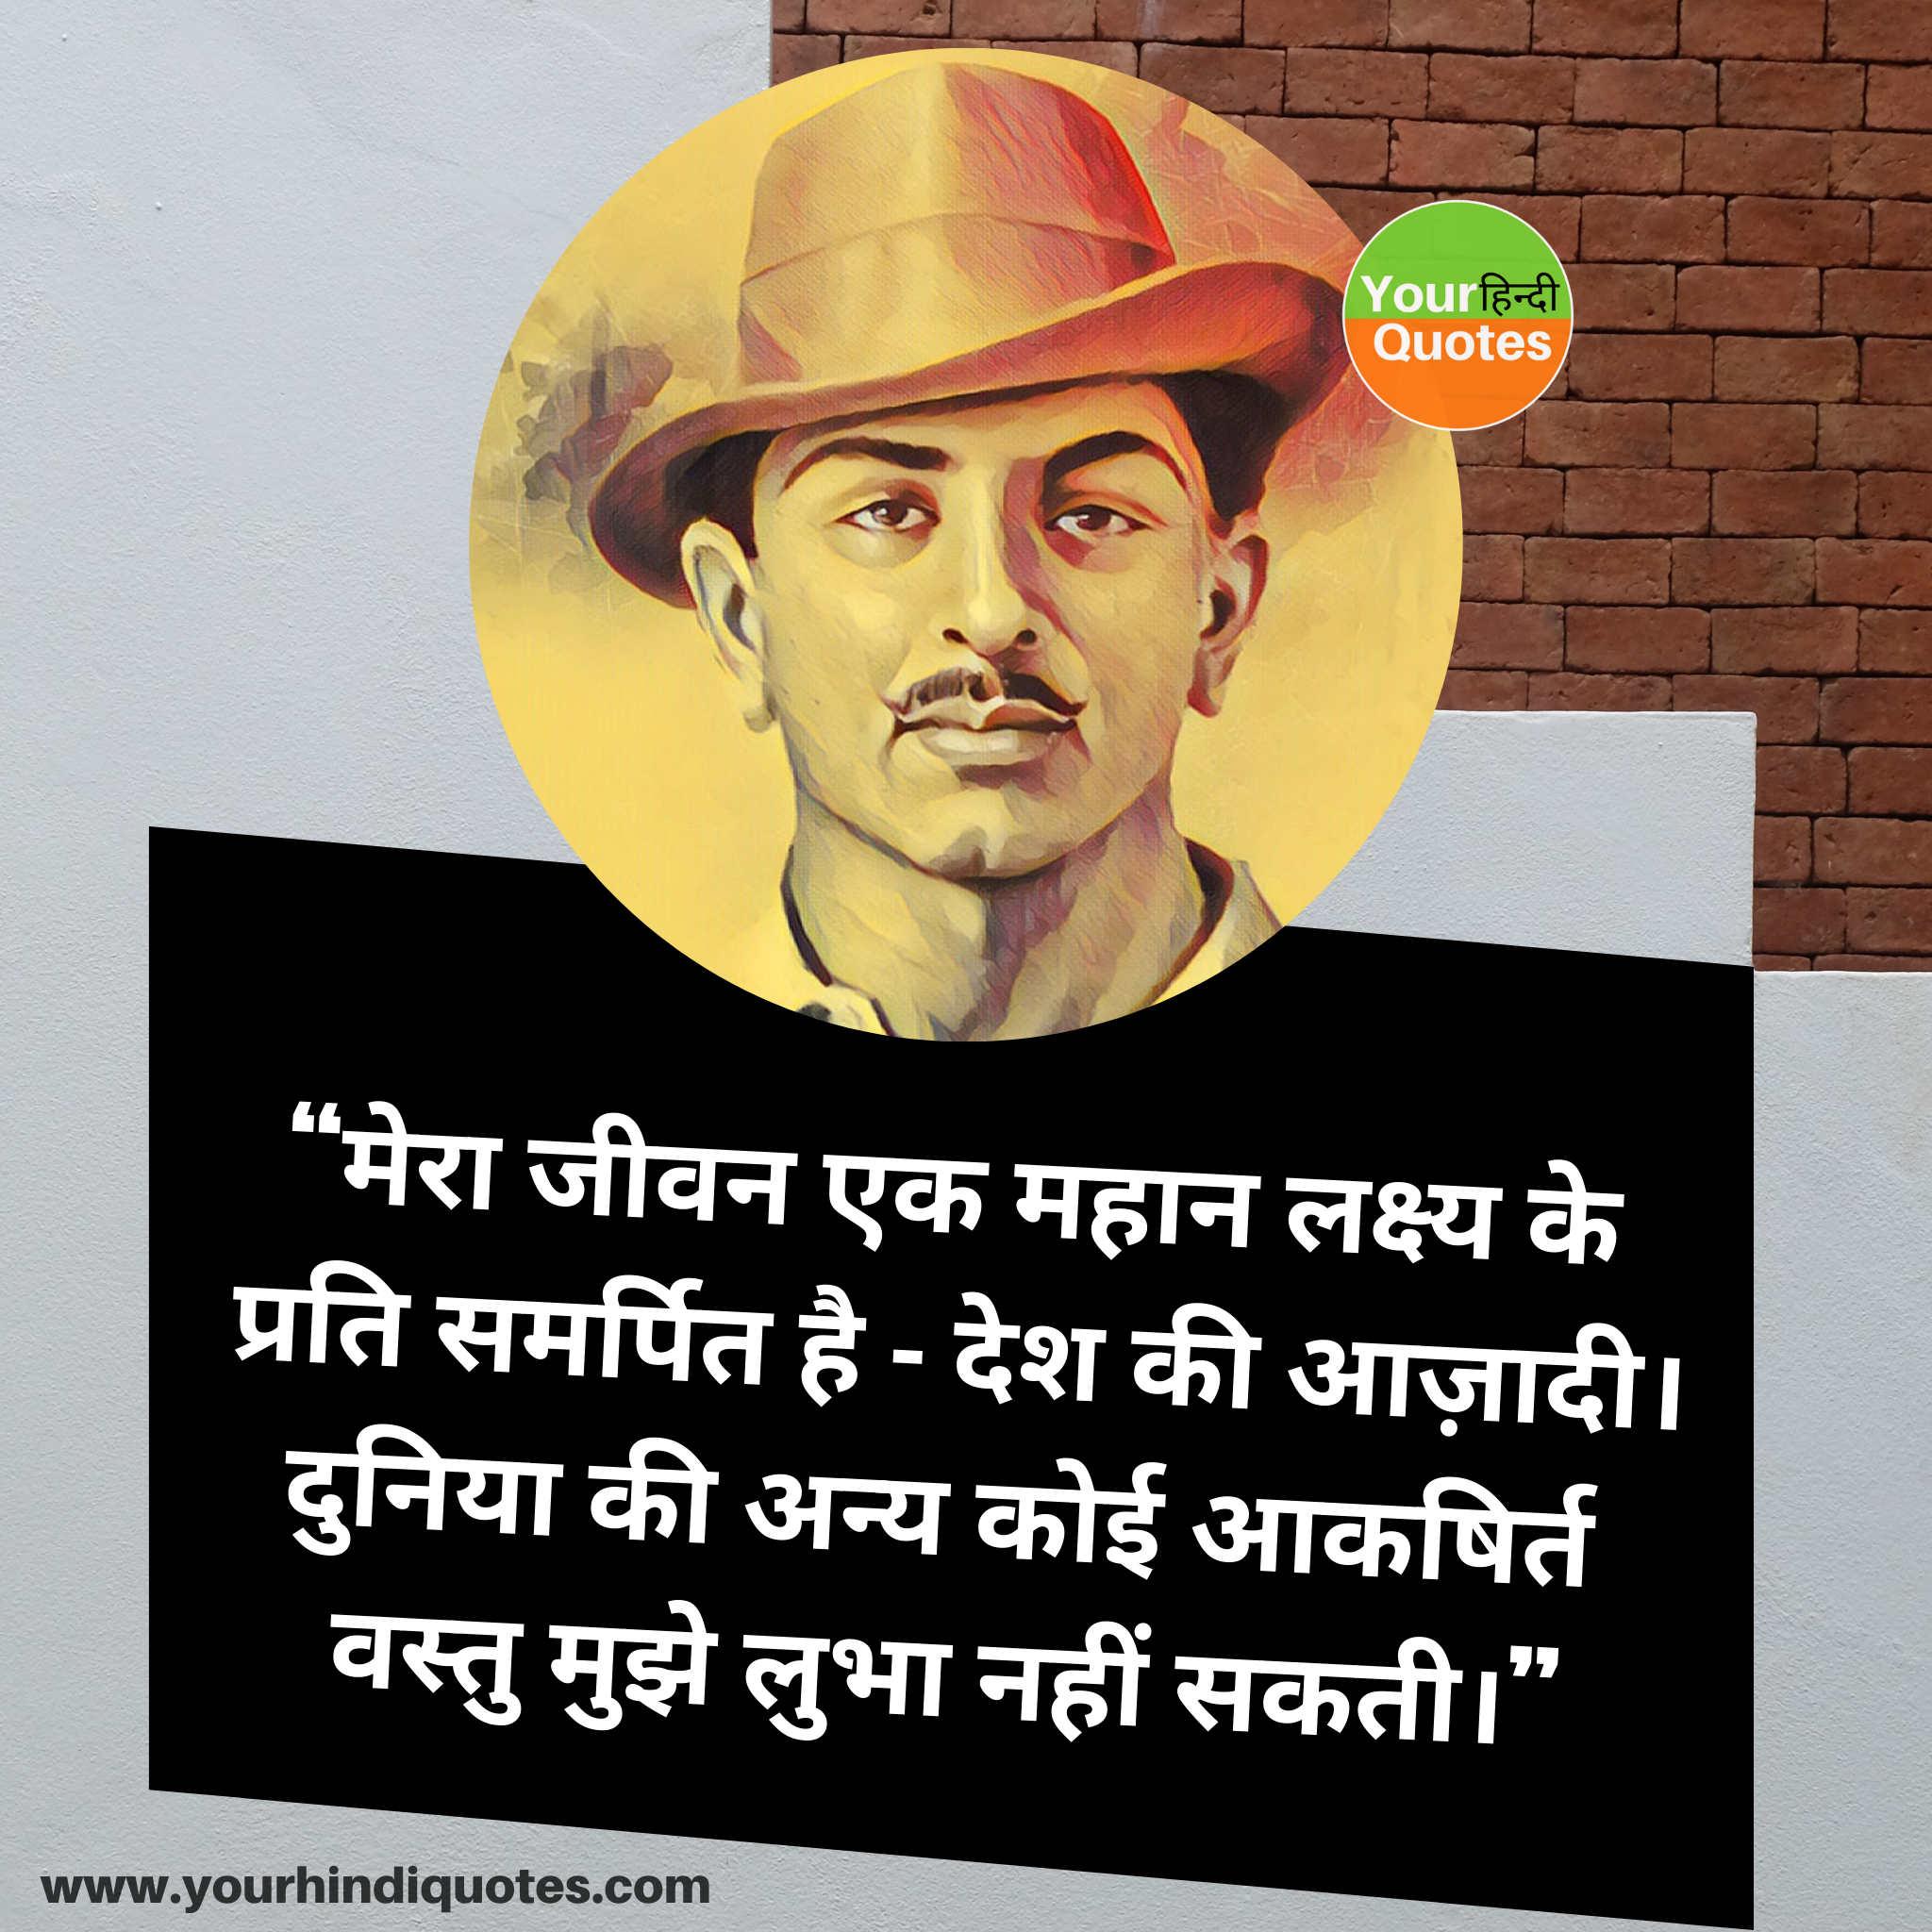 Hindi Bhagat Singh Quotes Images